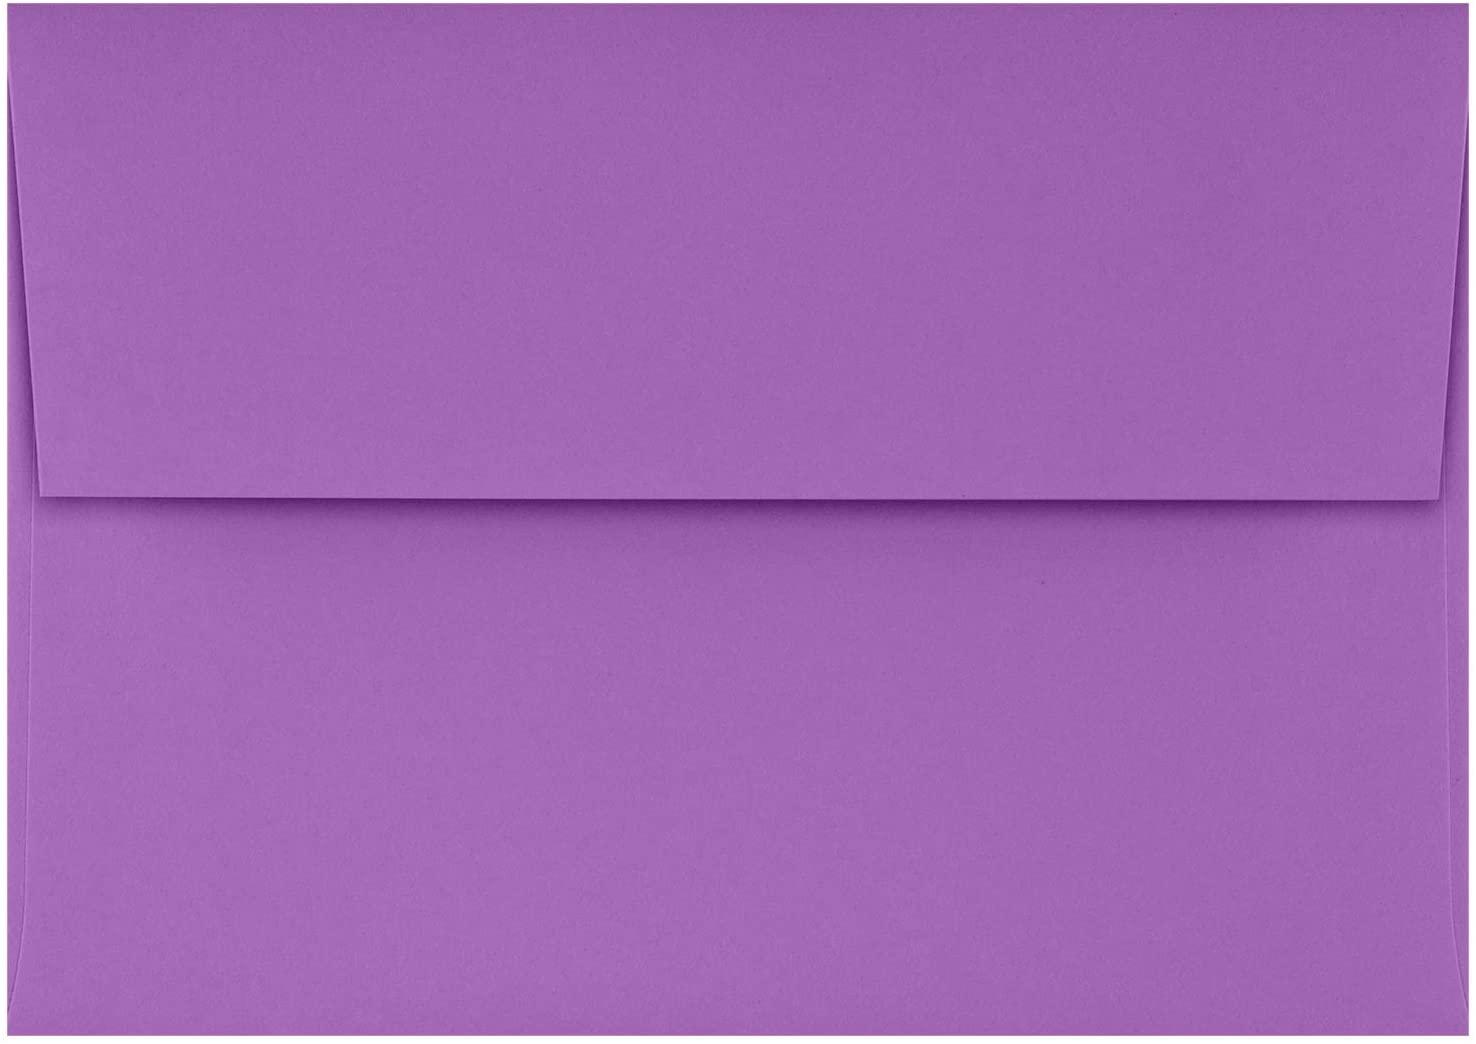 LUXPaper A1 Invitation Envelopes for 3 1/2